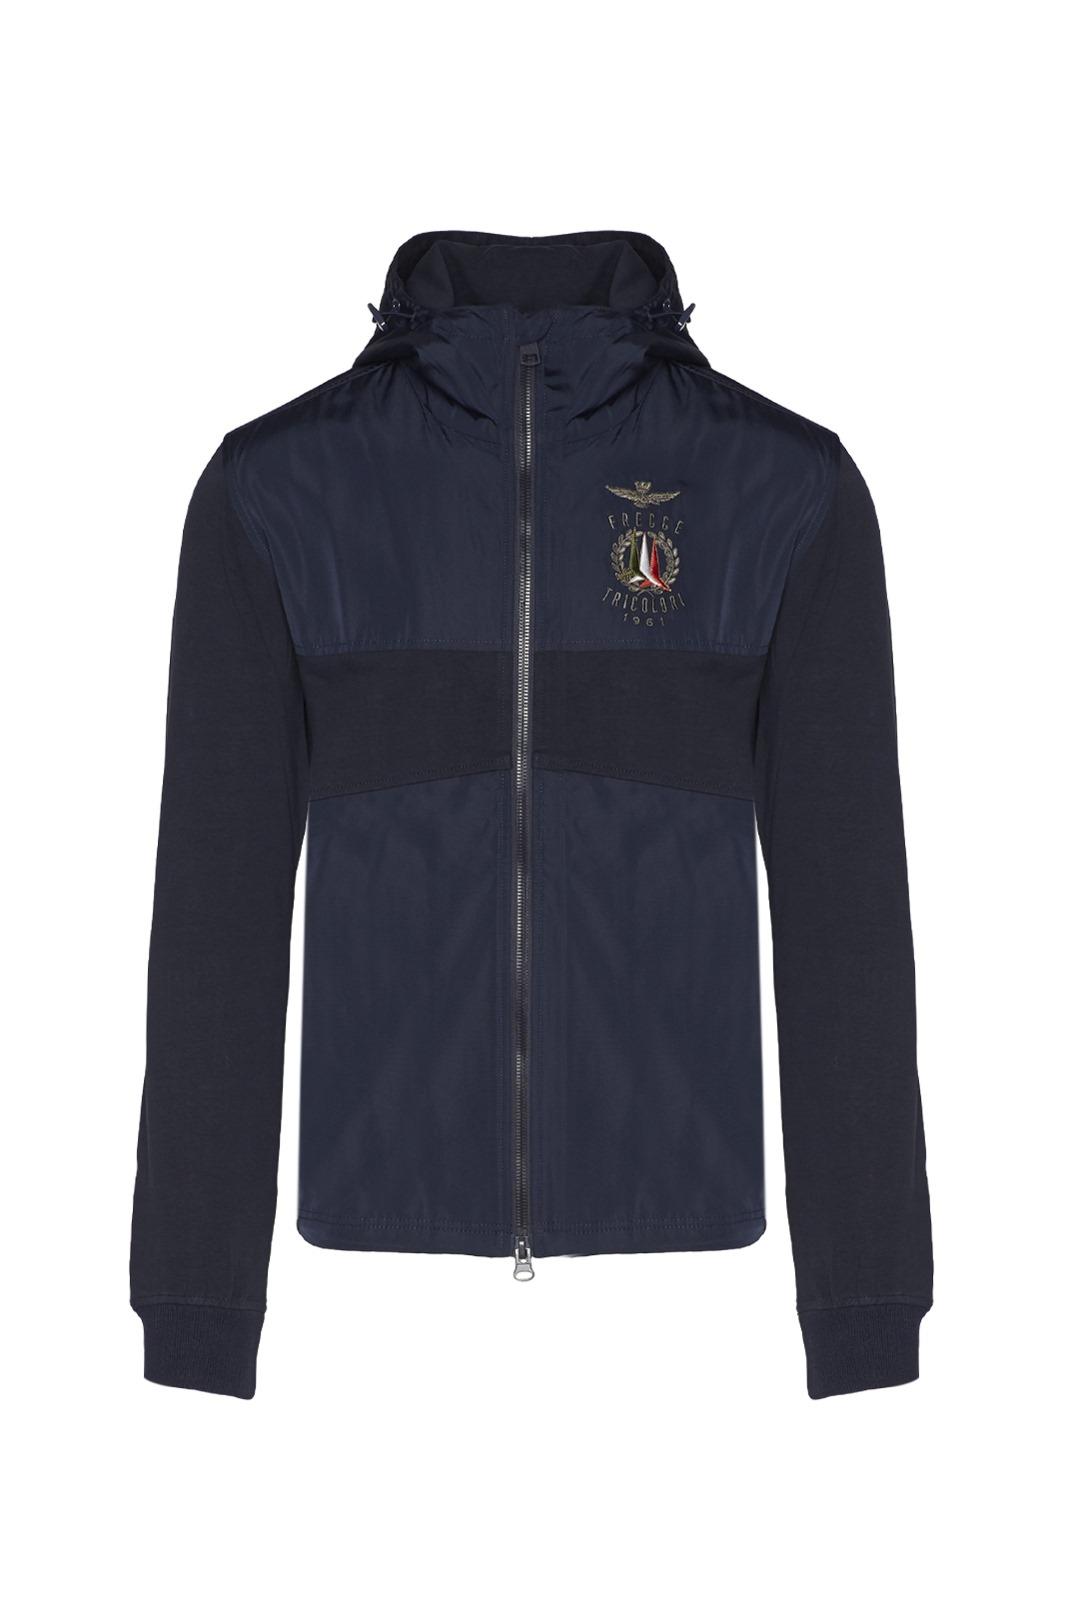 Frecce Tricolori fleece jacket           1